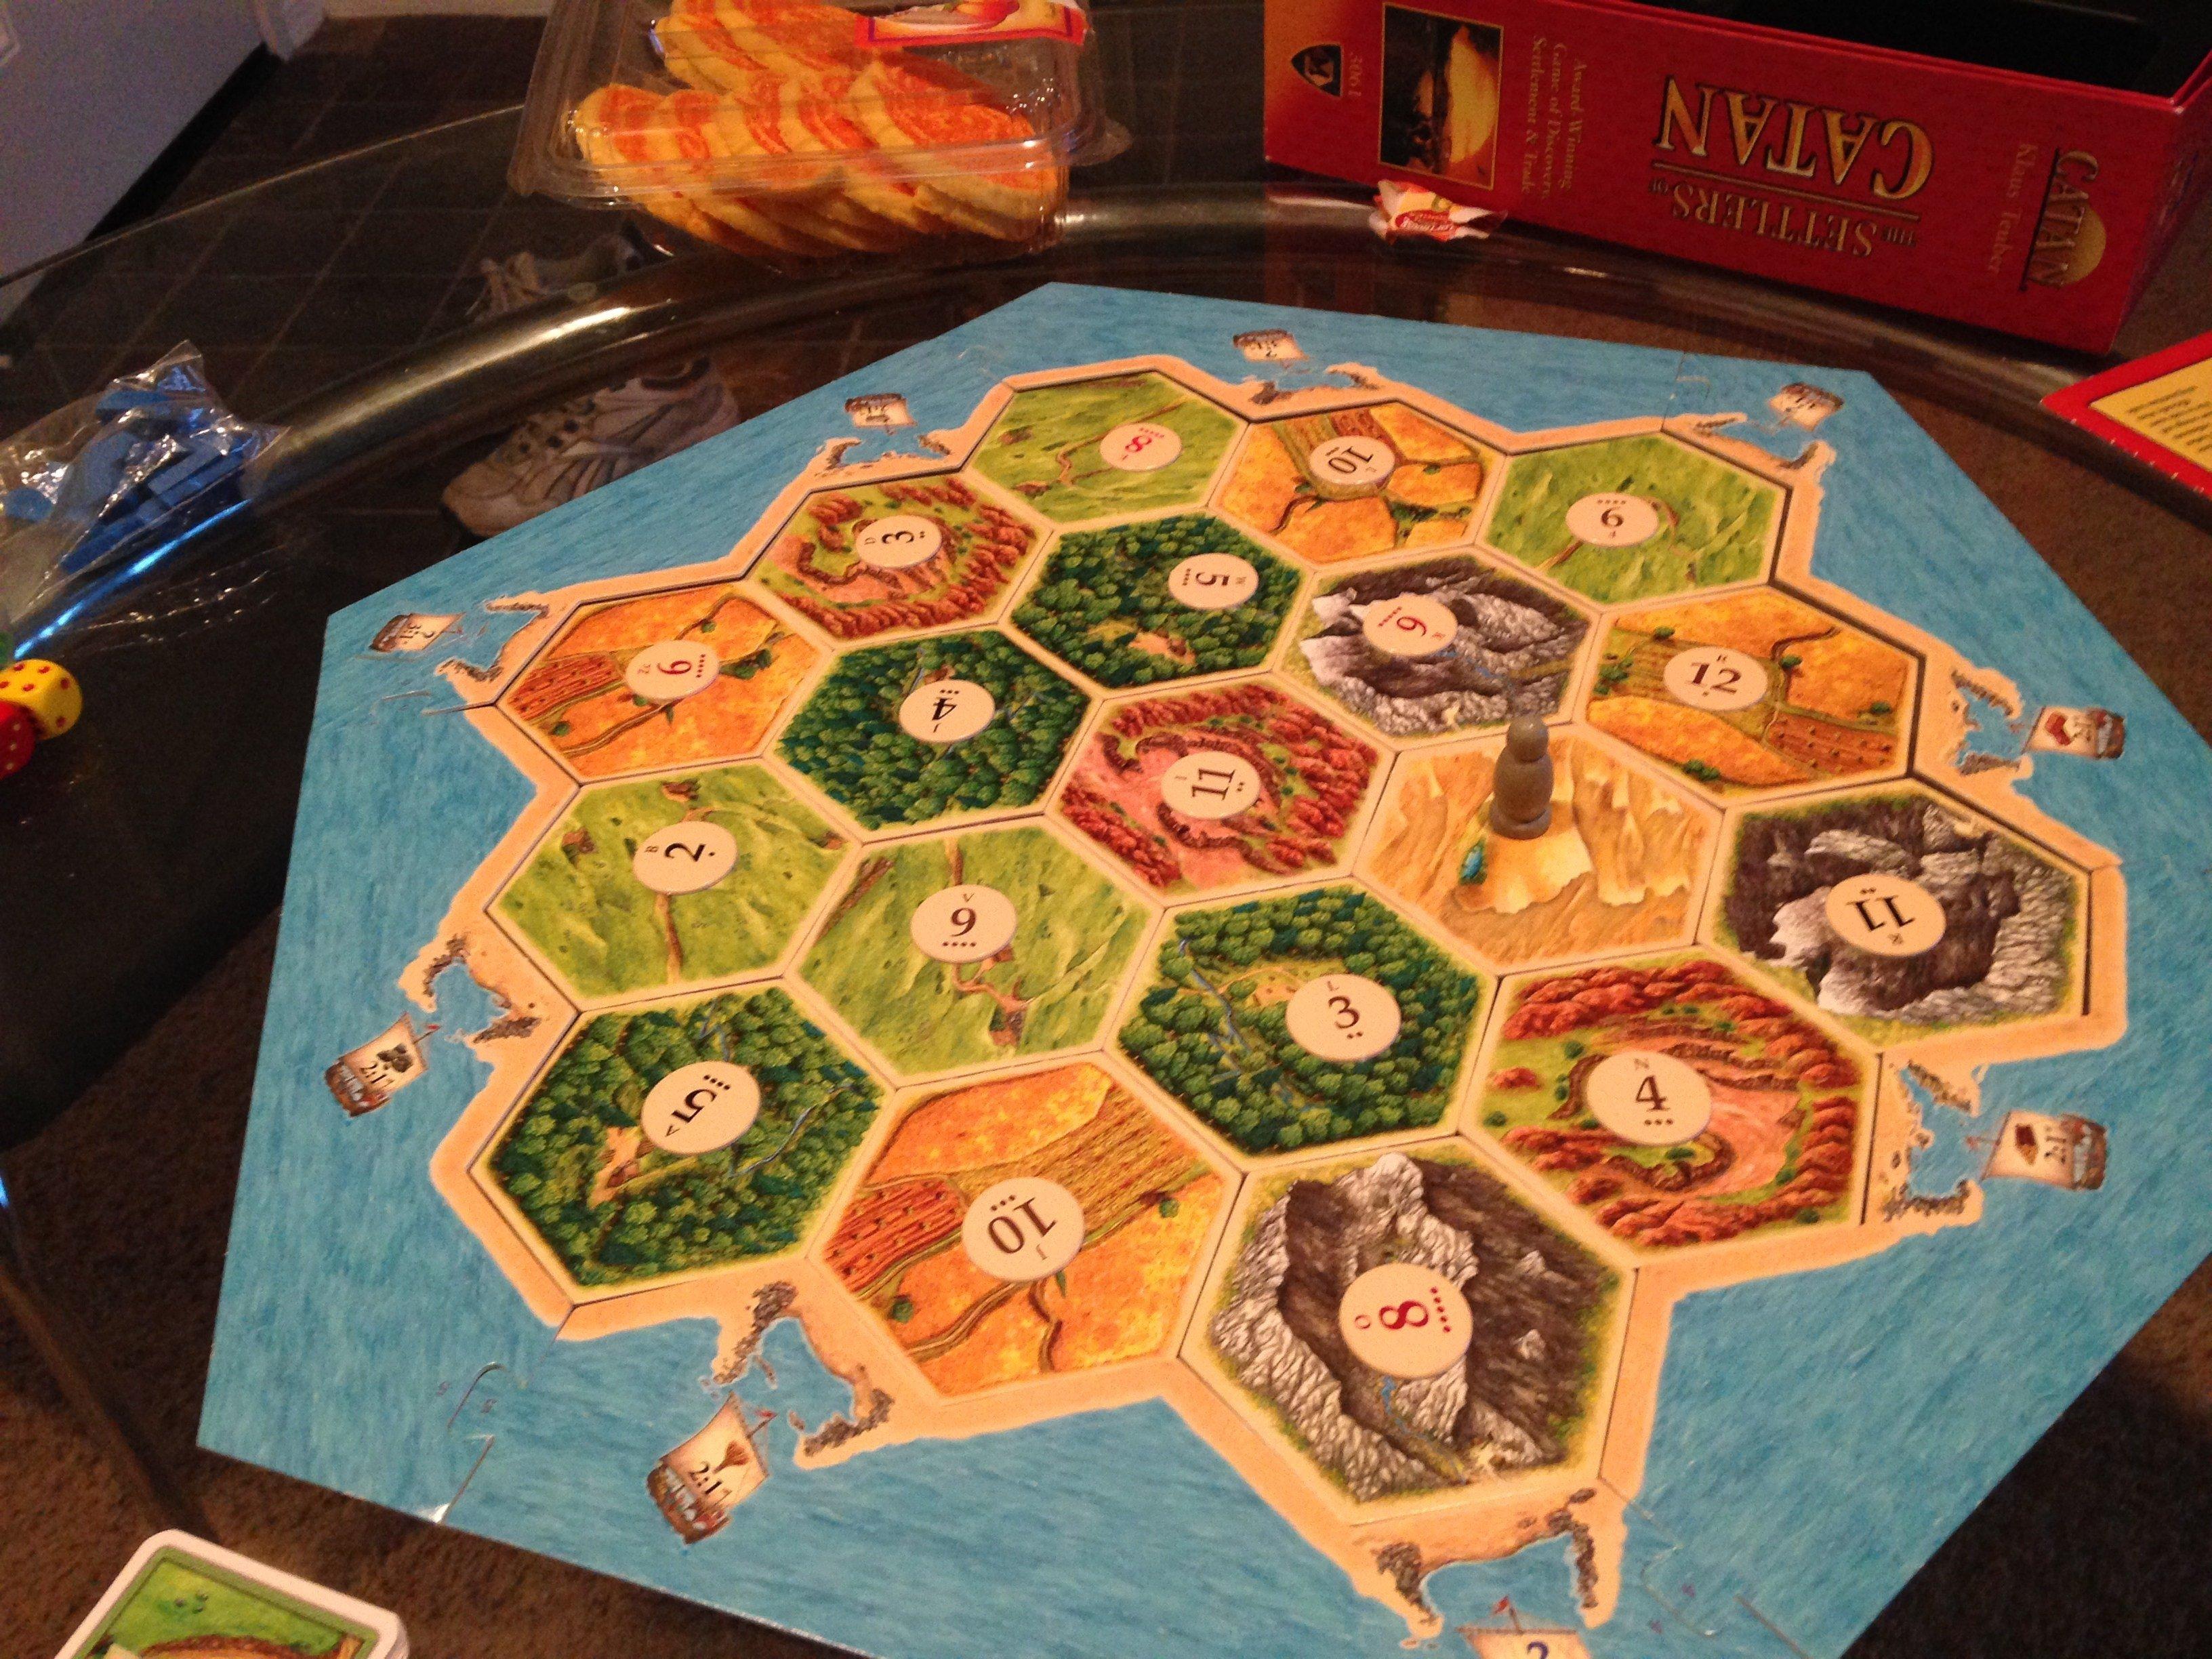 10 Attractive Ideas For A Board Game 5 board game gift ideas for new gamers my board game guides